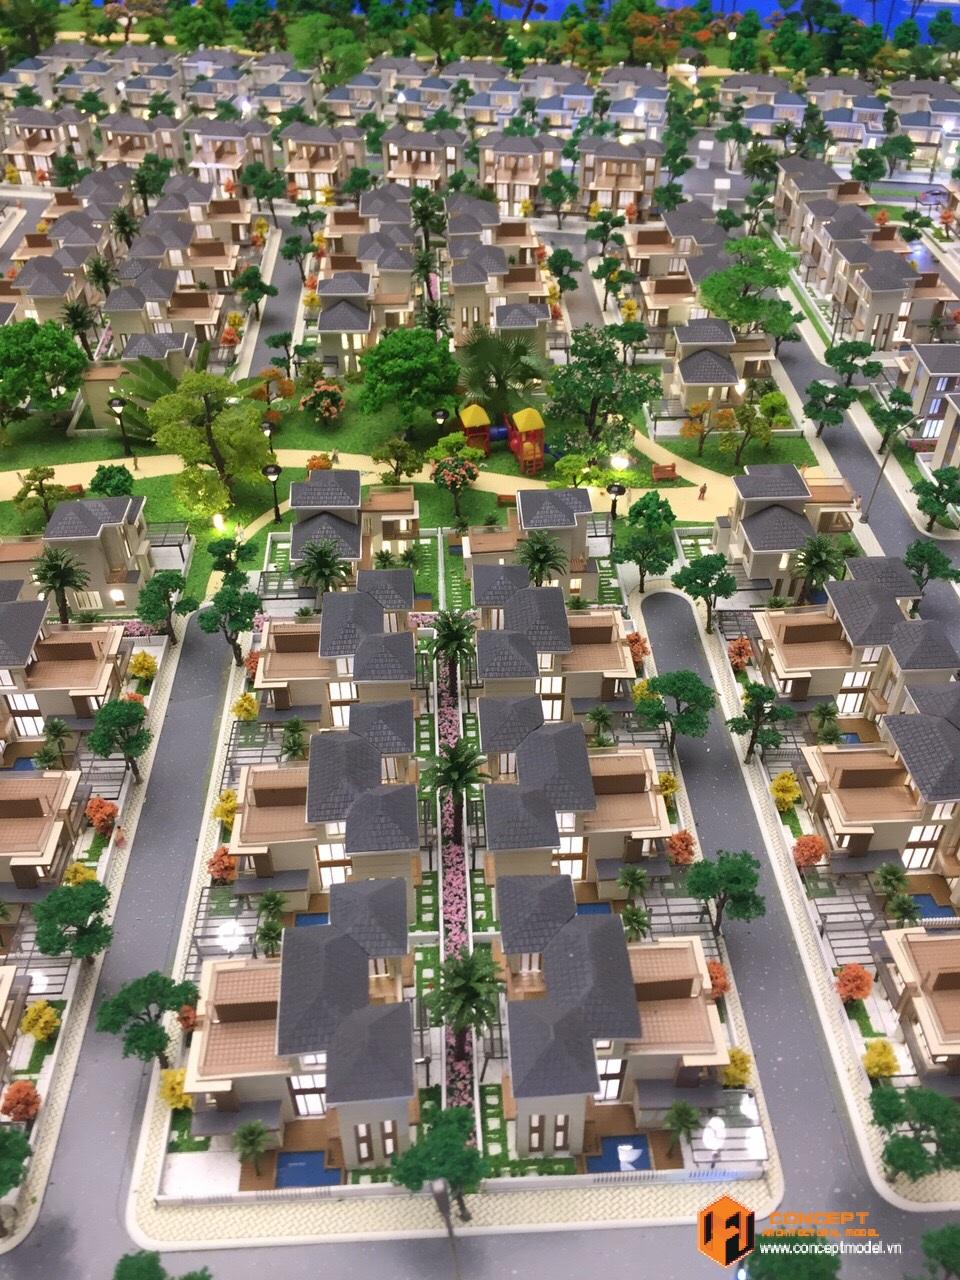 Dự án SwanBay Marina Villa City tập đoàn Swancity